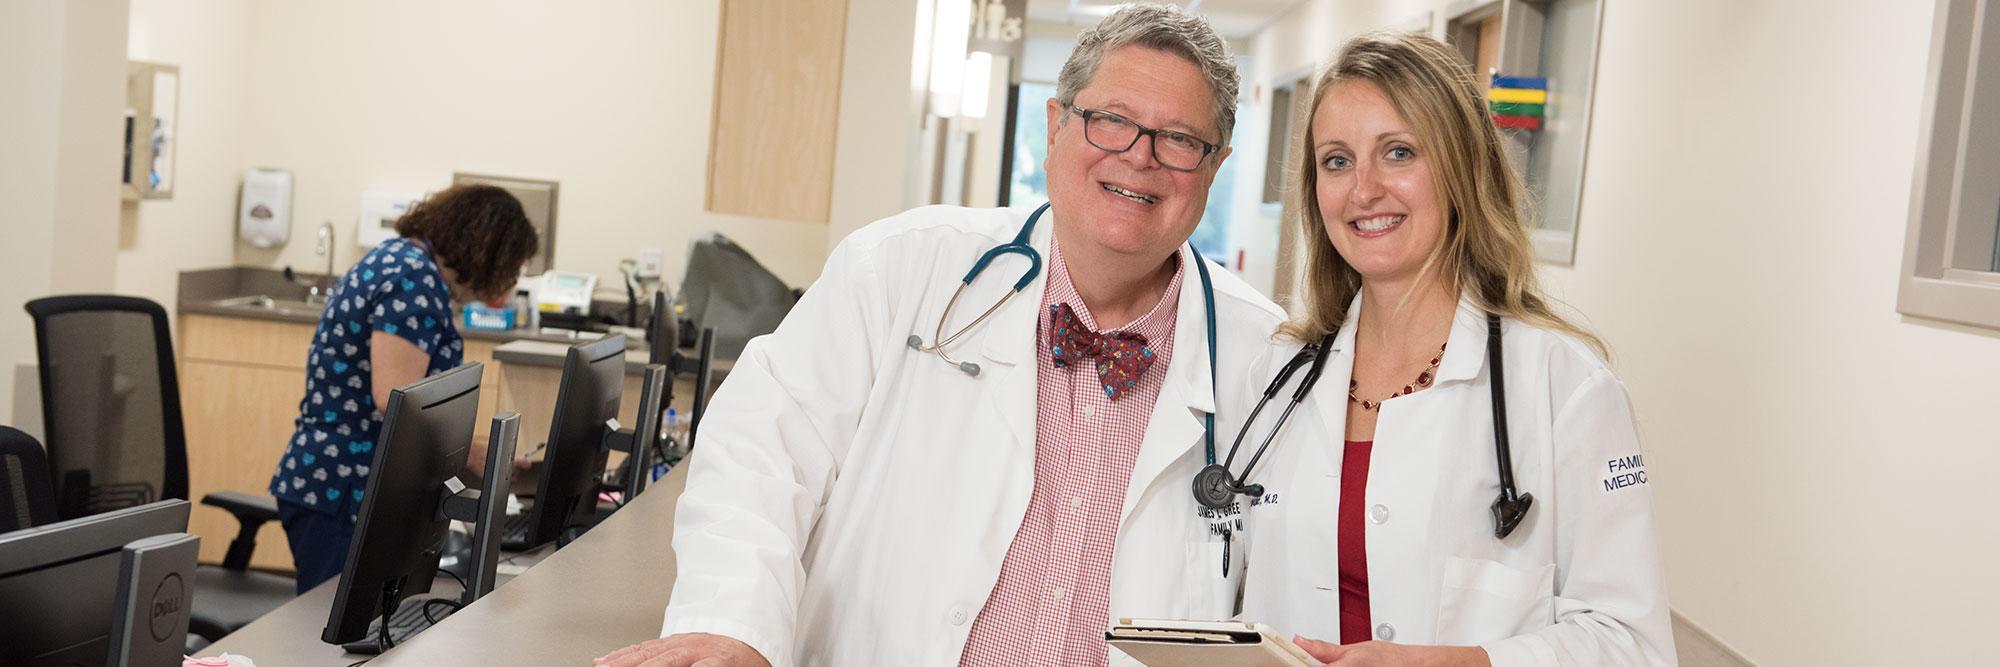 Department of Family Medicine | Family Medicine | SUNY